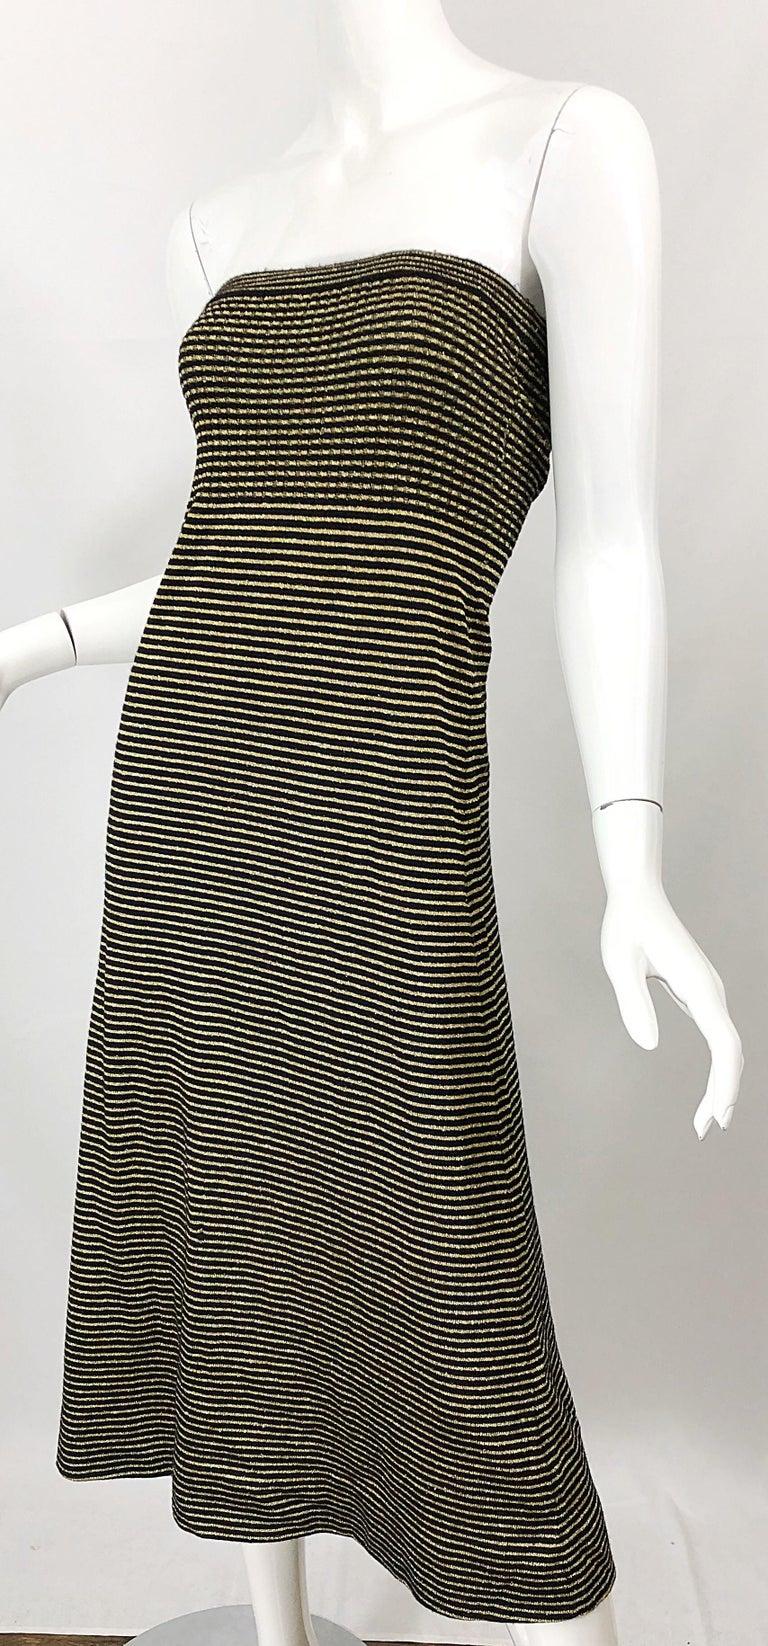 Vintage Yves Saint Laurent YSL 70s Gold Black Strapless Knit Dress or Maxi Skirt For Sale 8